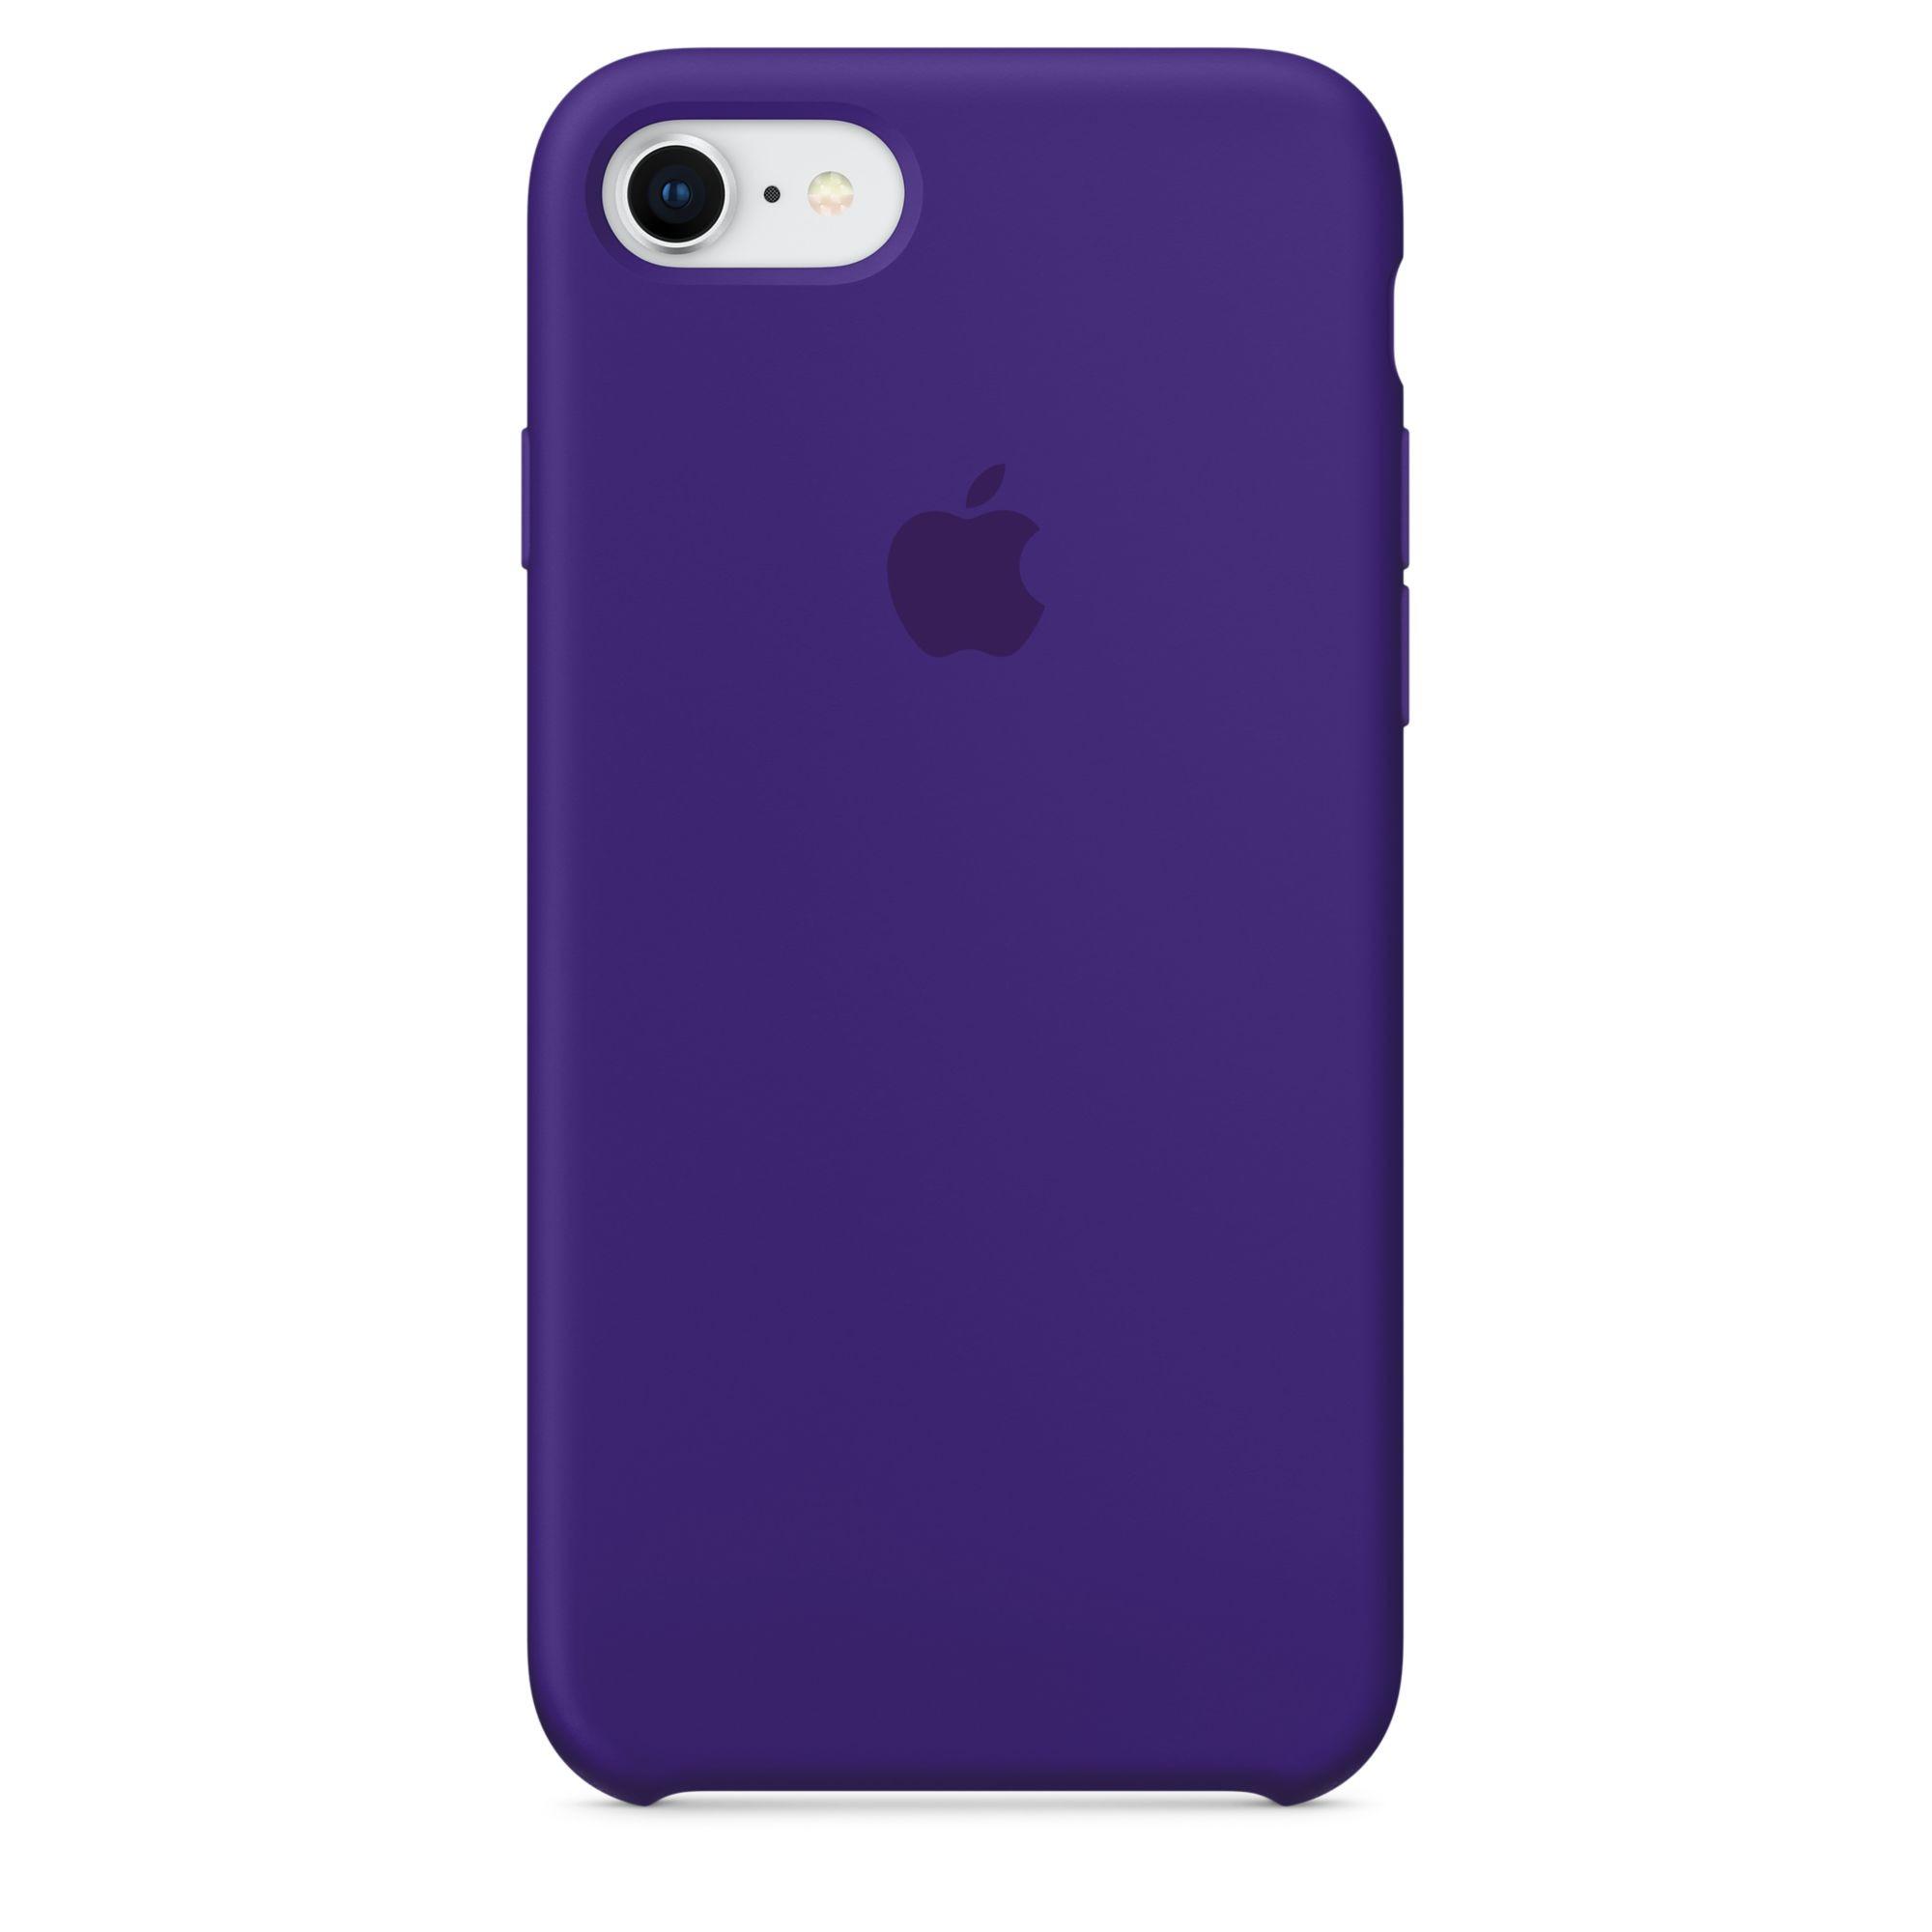 Apple silikonový kryt na iPhone 8 / 7 – tmavě fialový